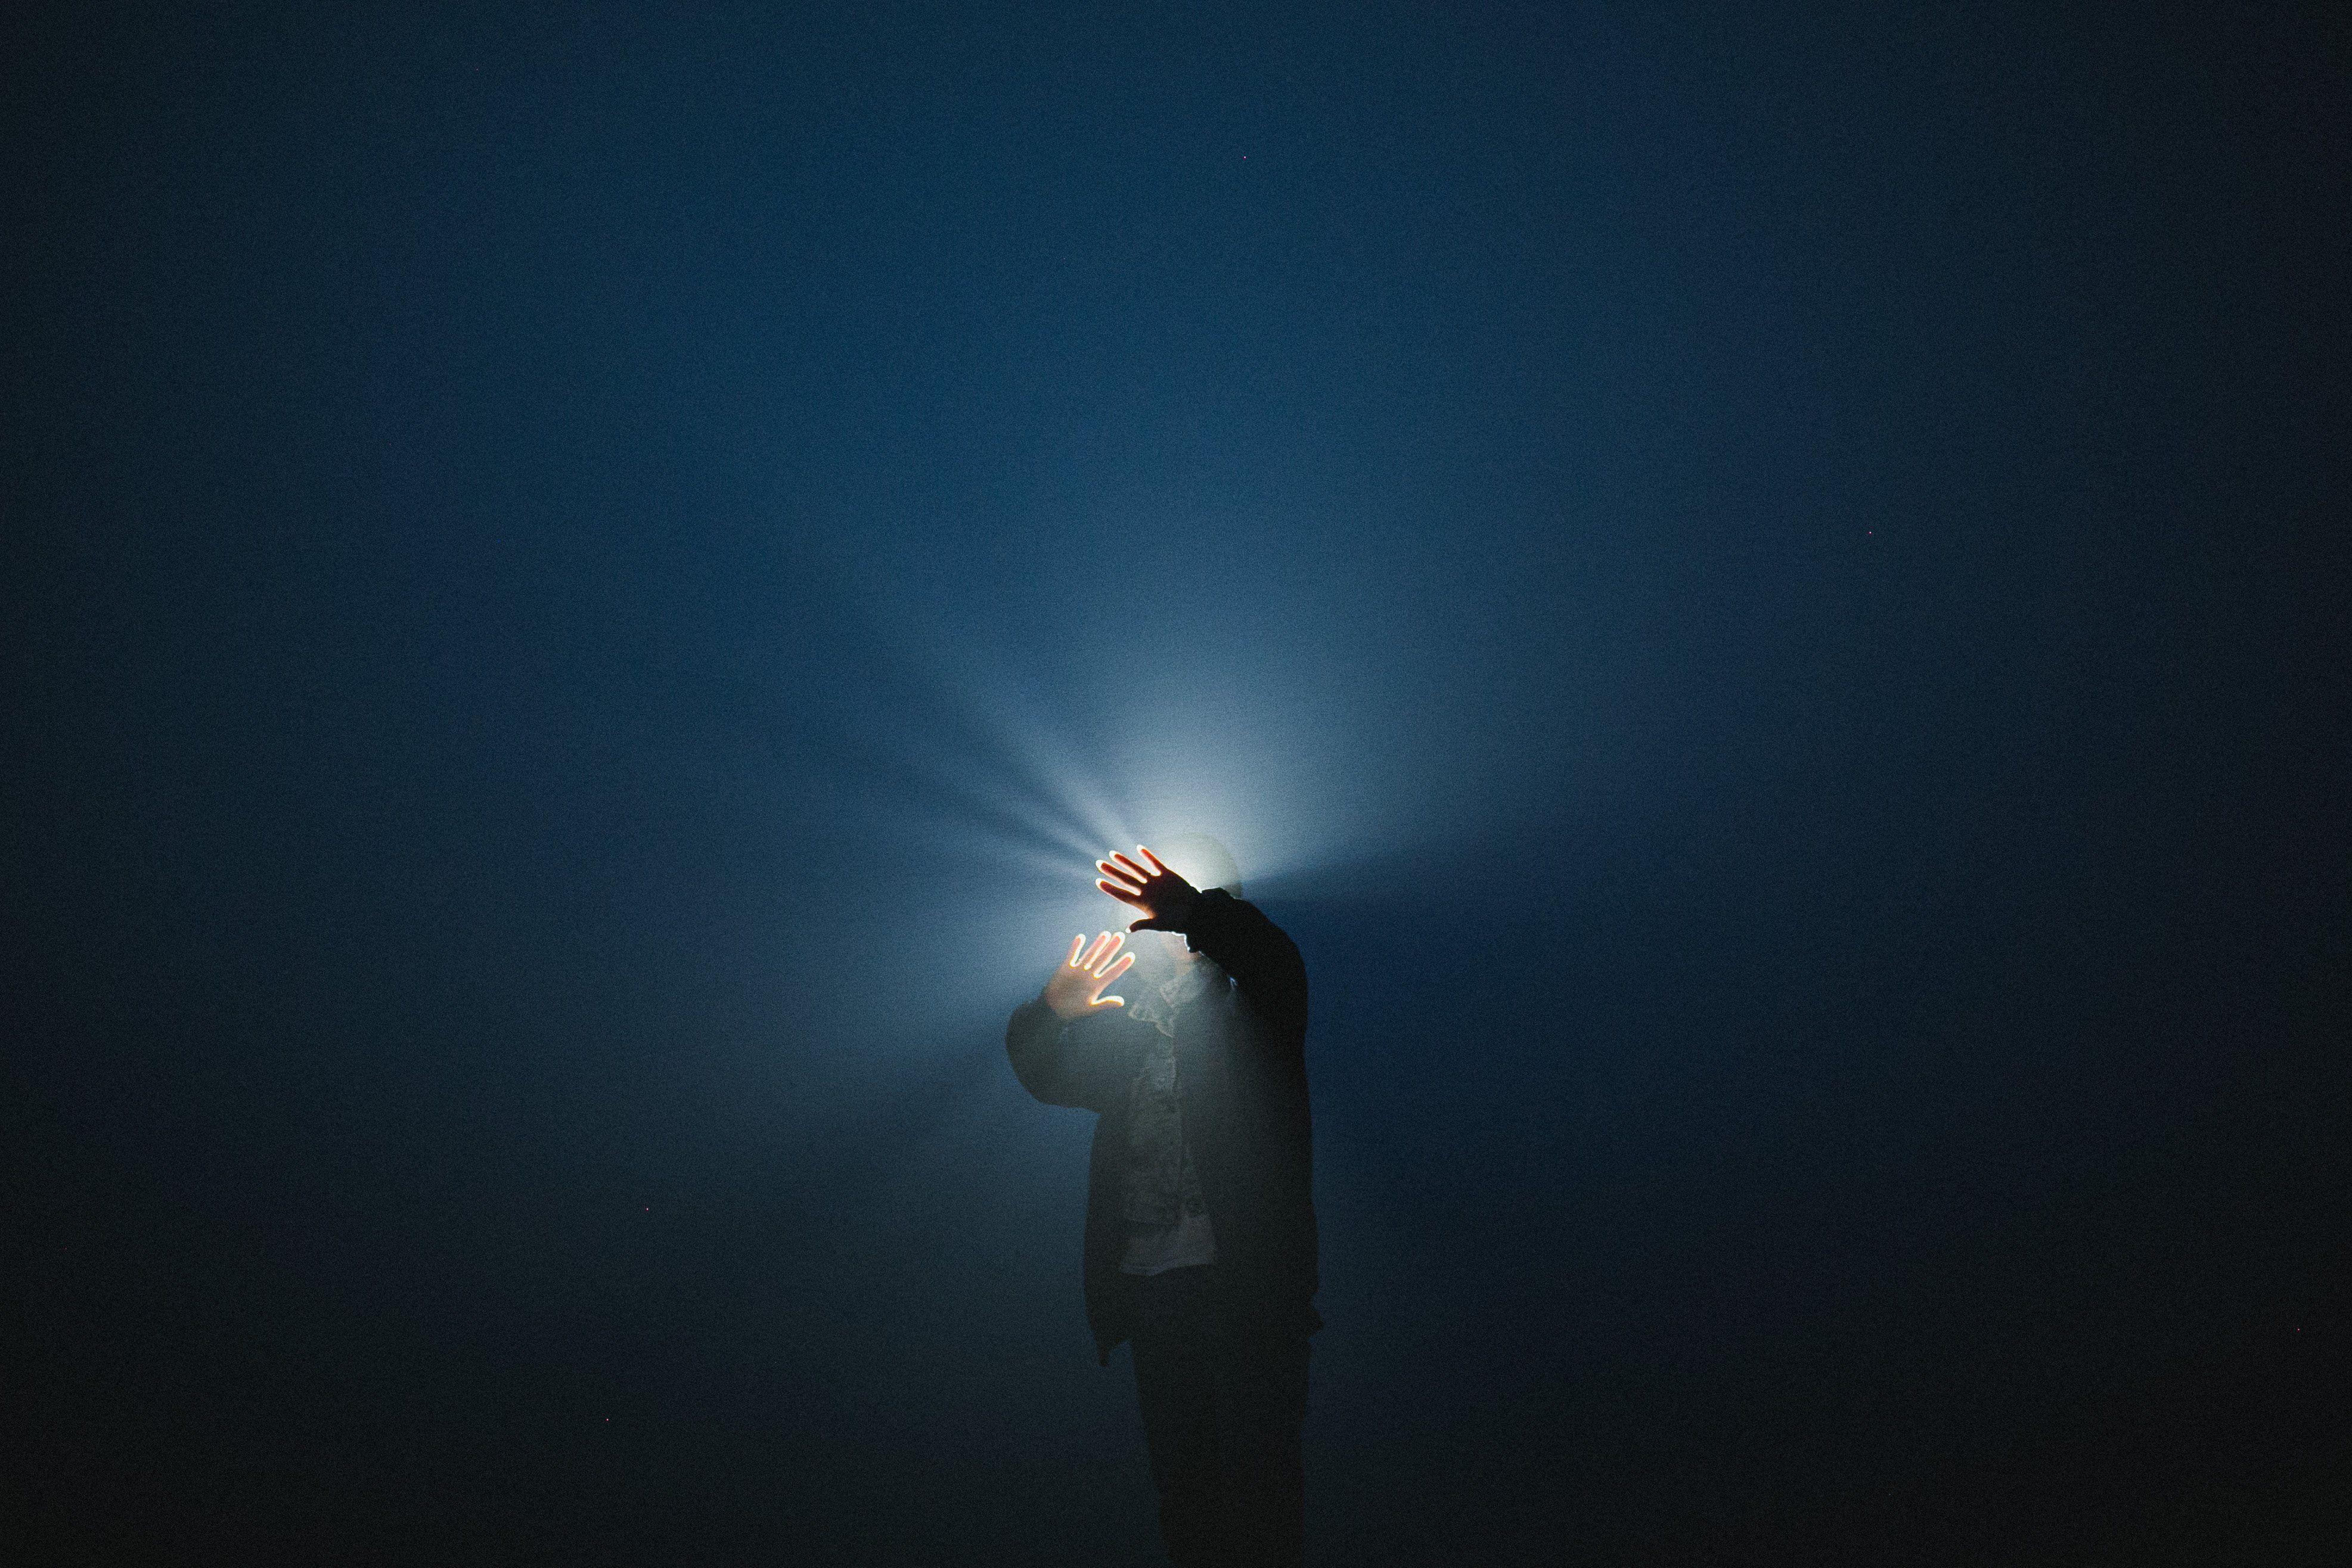 ночь туман свет, Воронин Вова